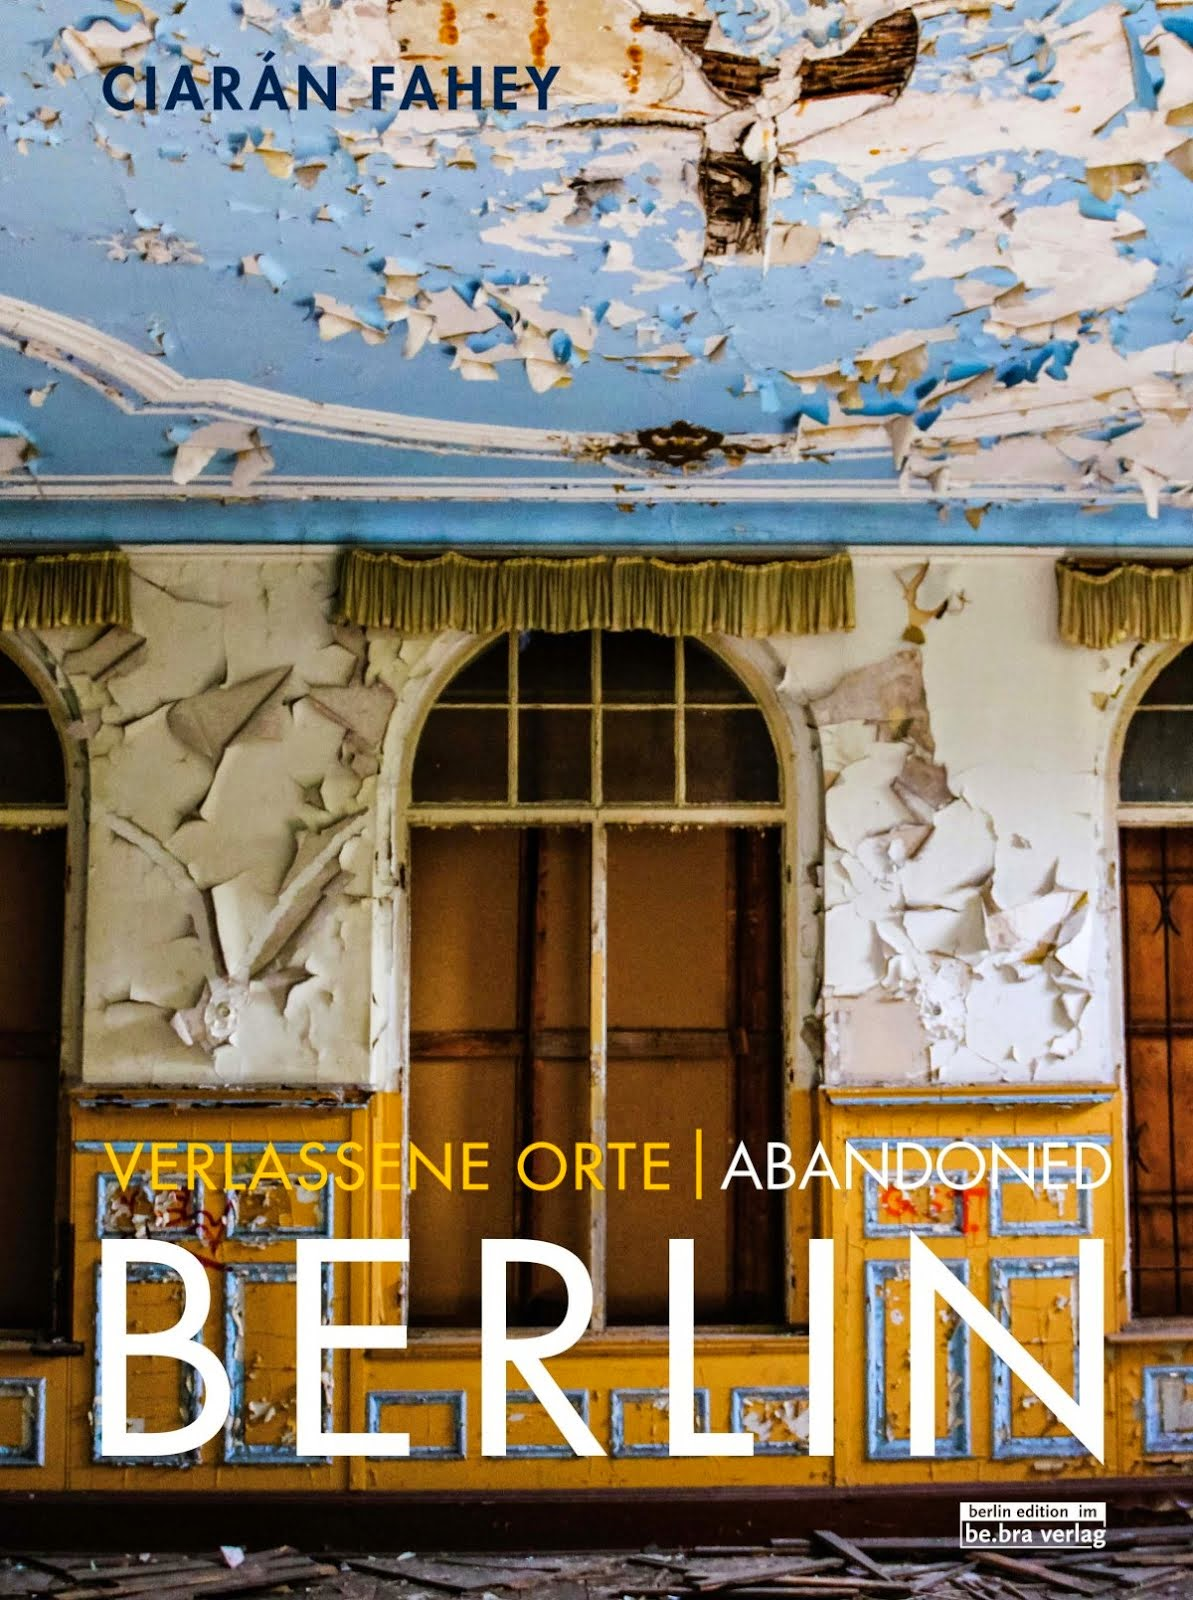 Kaisers Karlshorst garbáty 39 s abandoned cigarette factory abandoned berlin